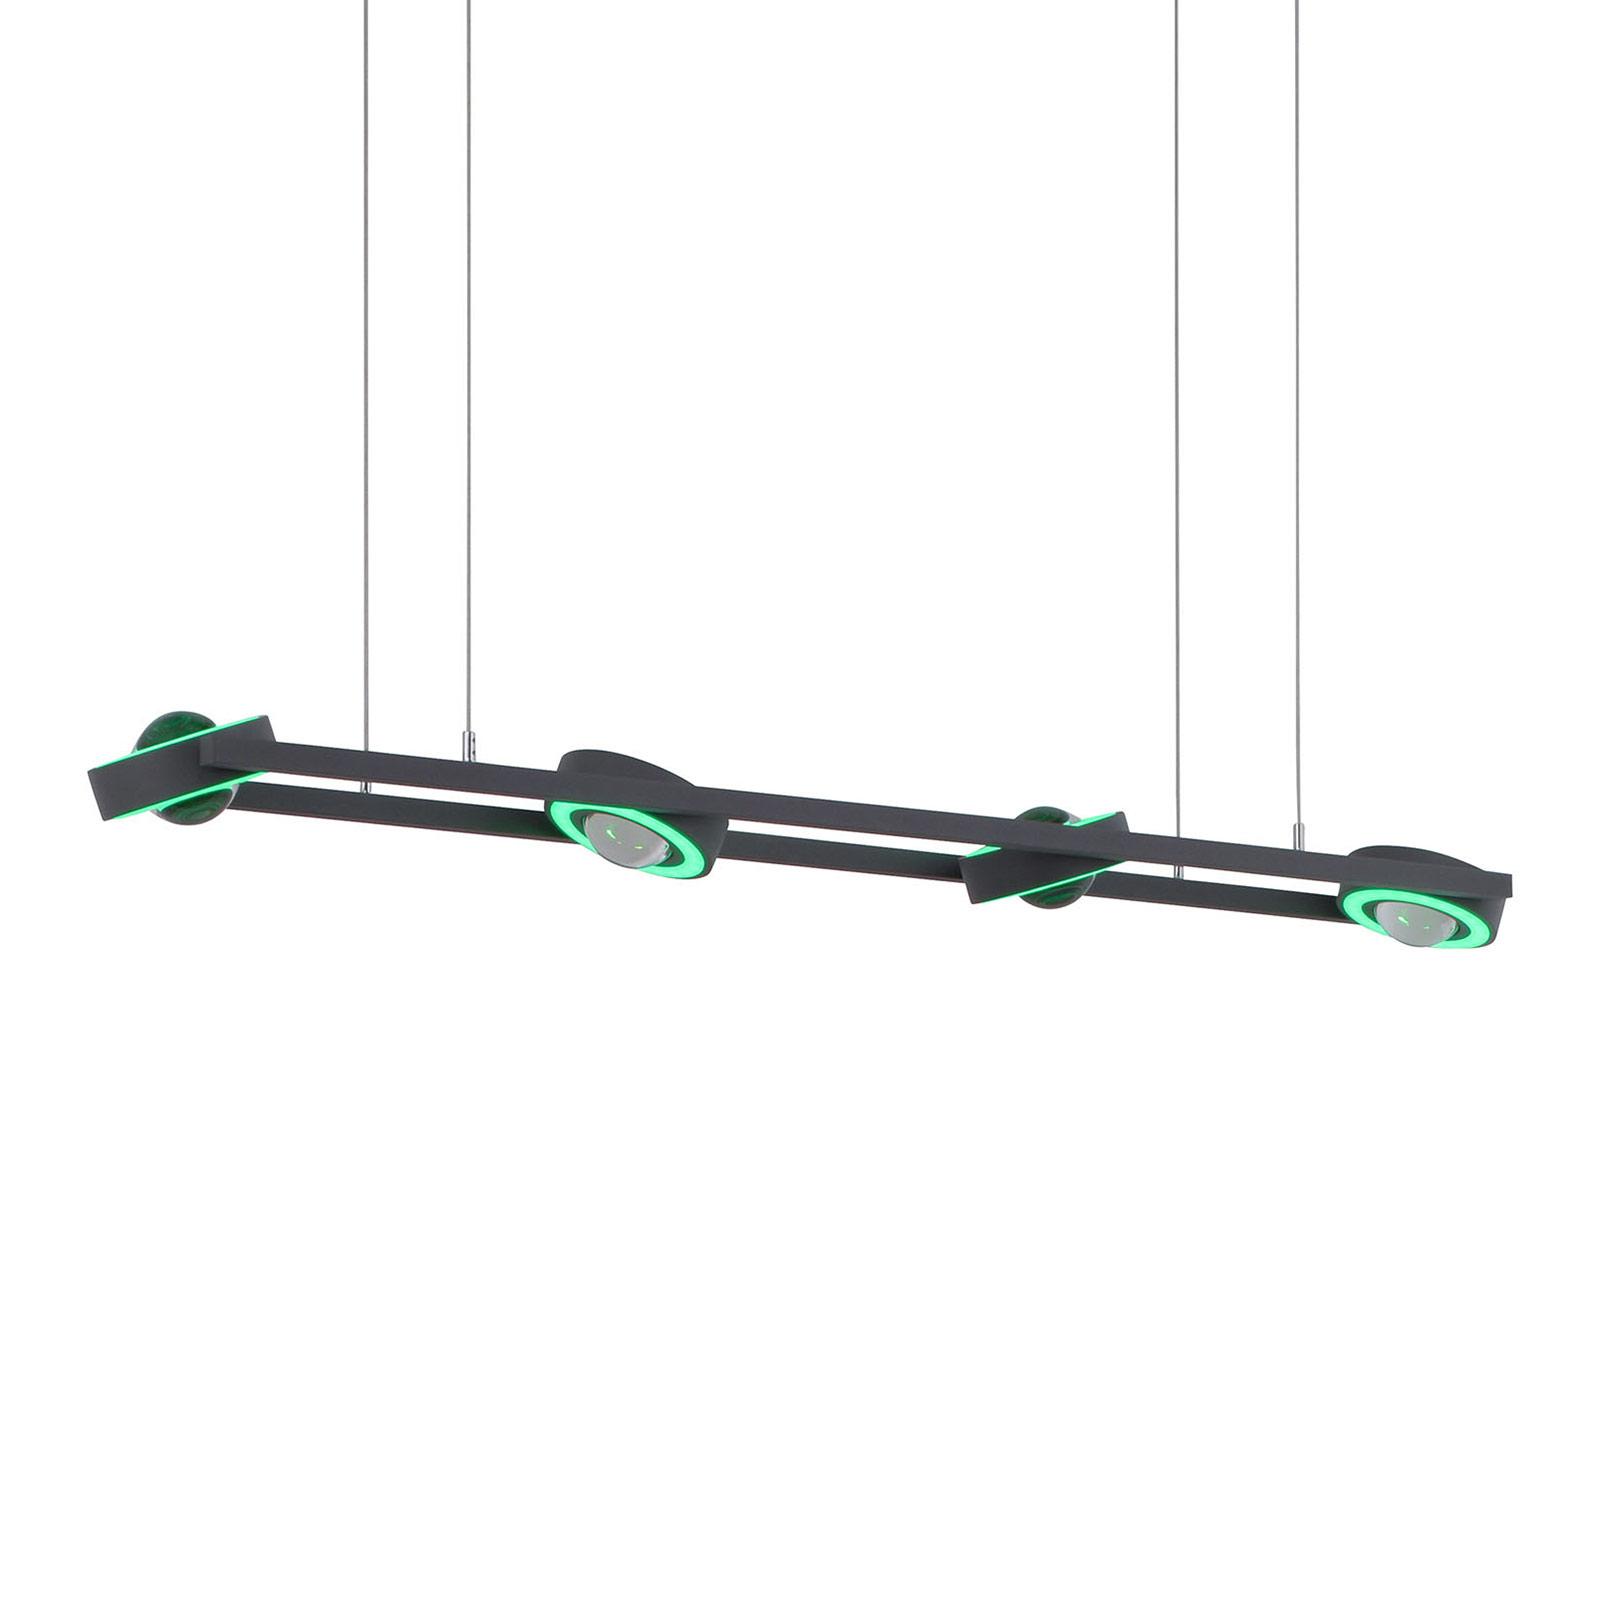 Paul Neuhaus Q-MIA LED hanglamp, antraciet